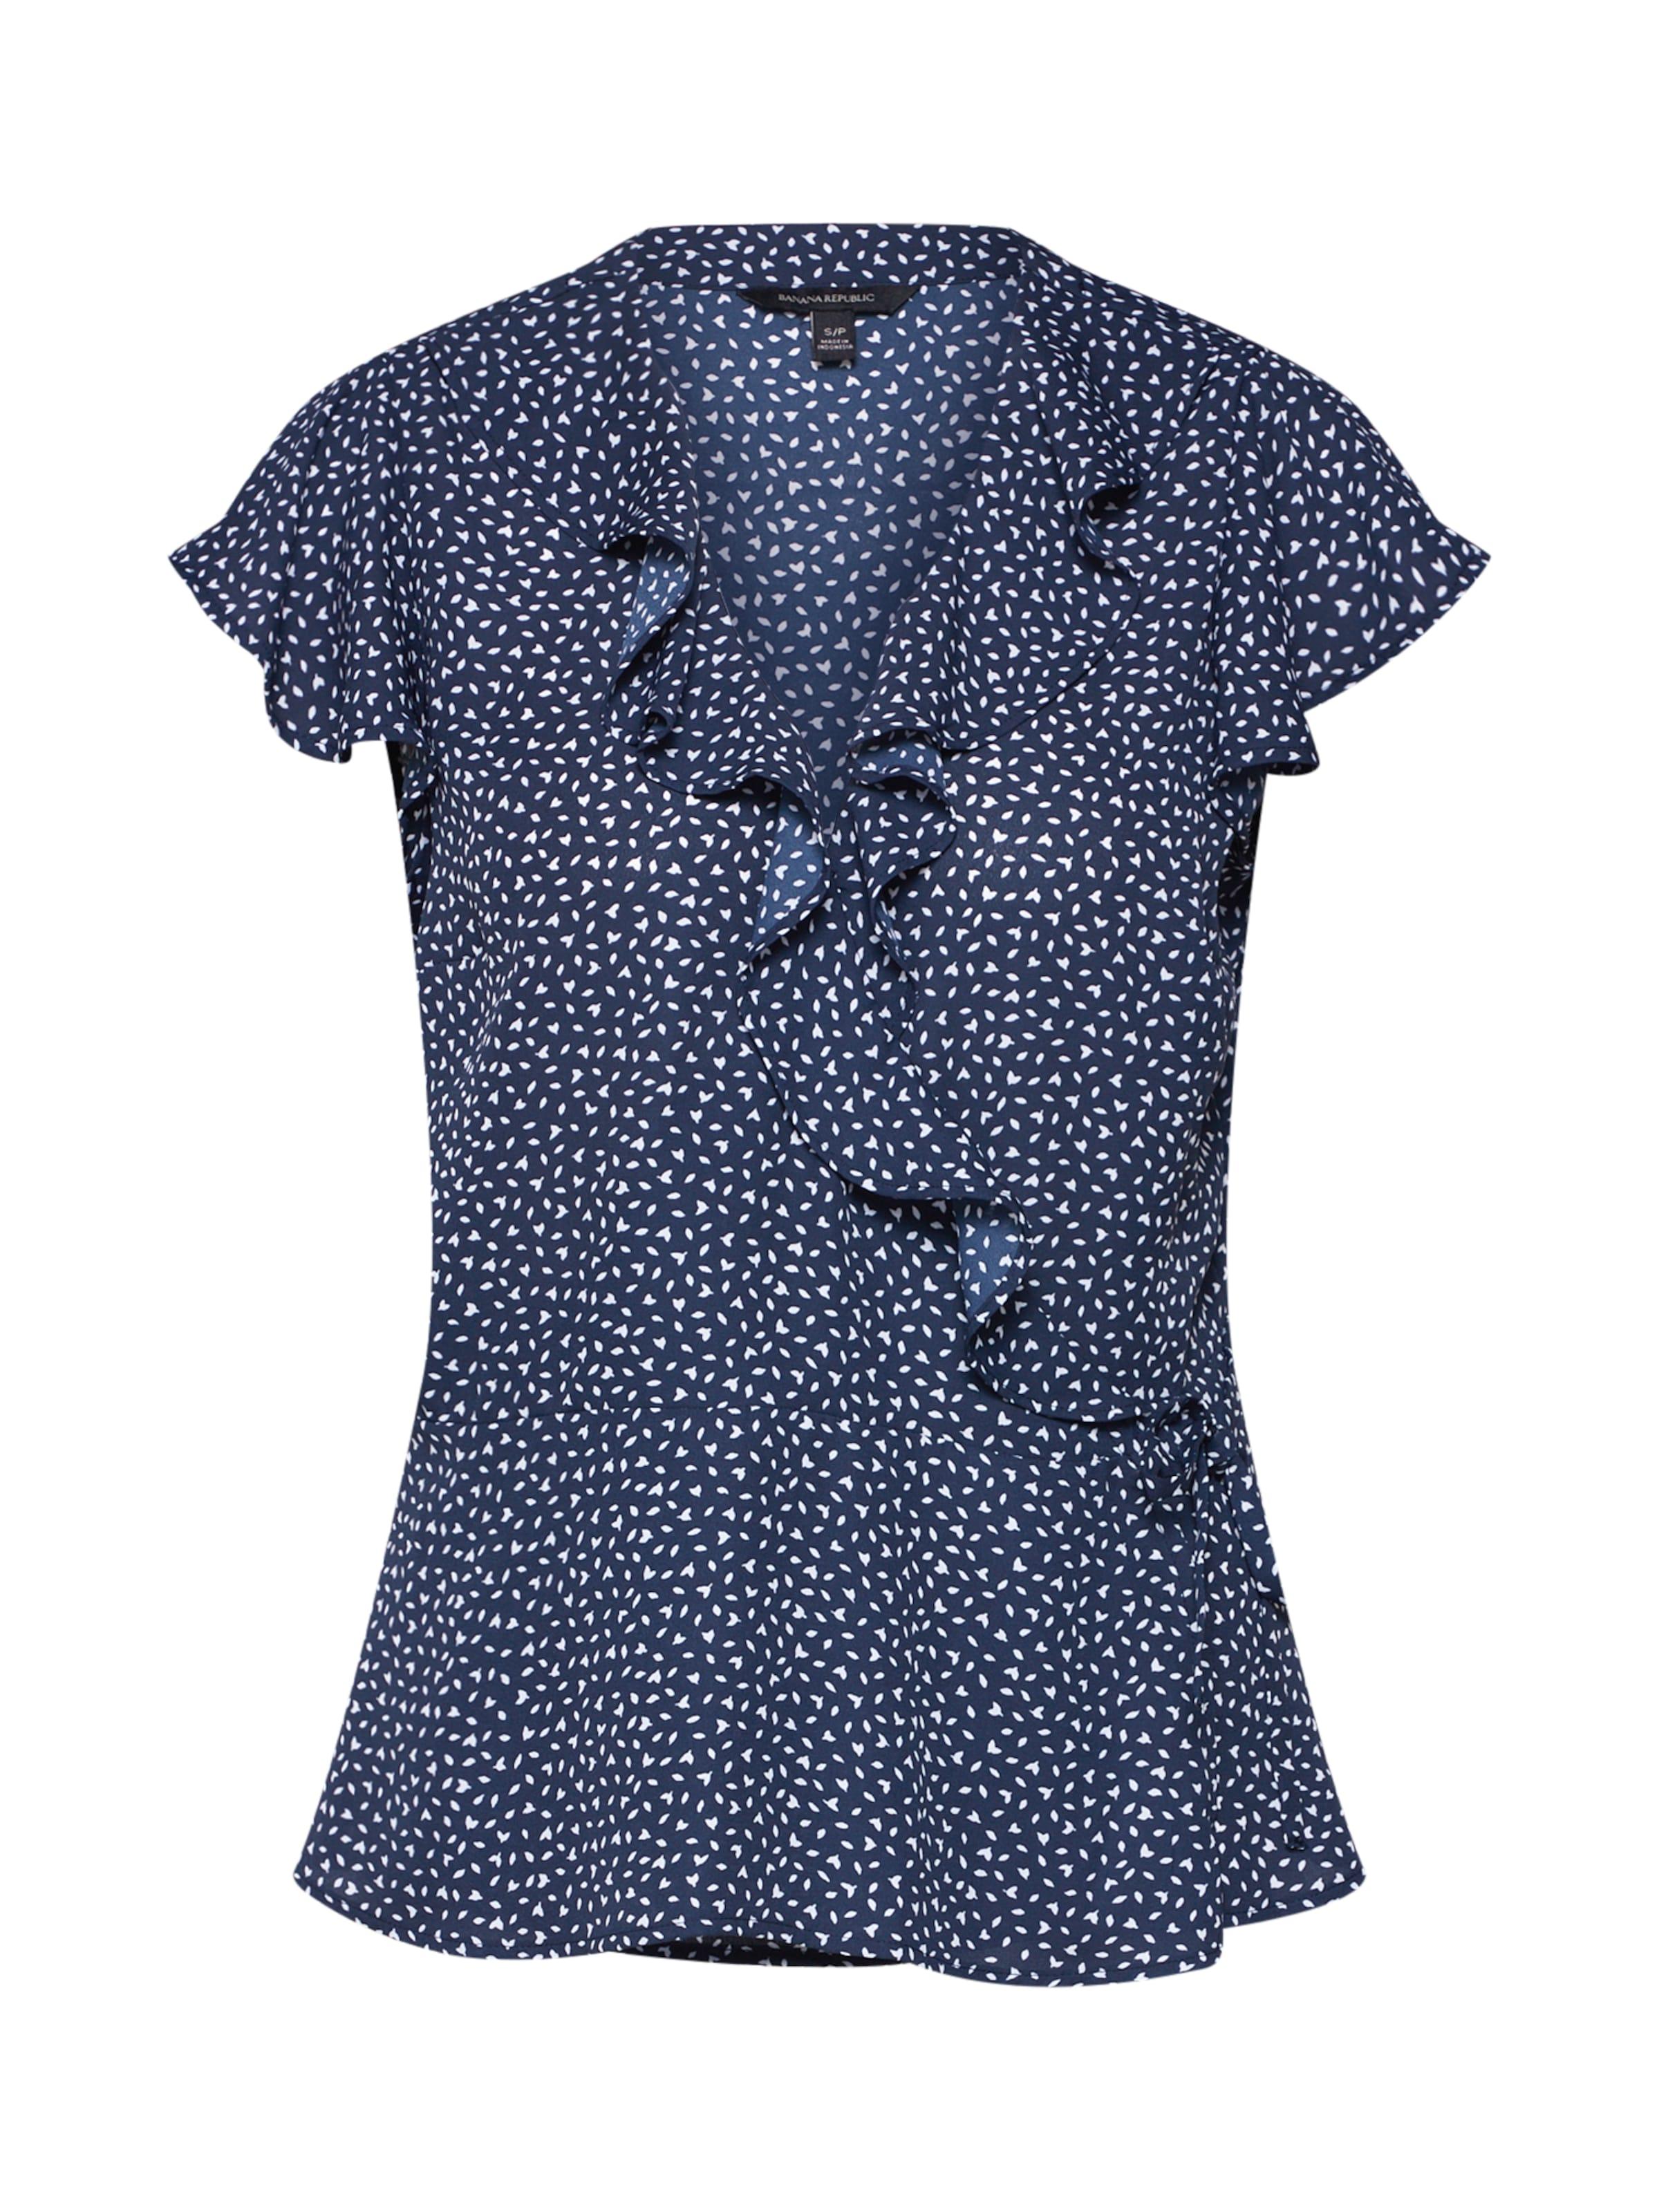 Top Bleu shirt 'ss Republic Leaves' Wrap T Banana Ruffle Noprint Marine En 1JcuF5TlK3